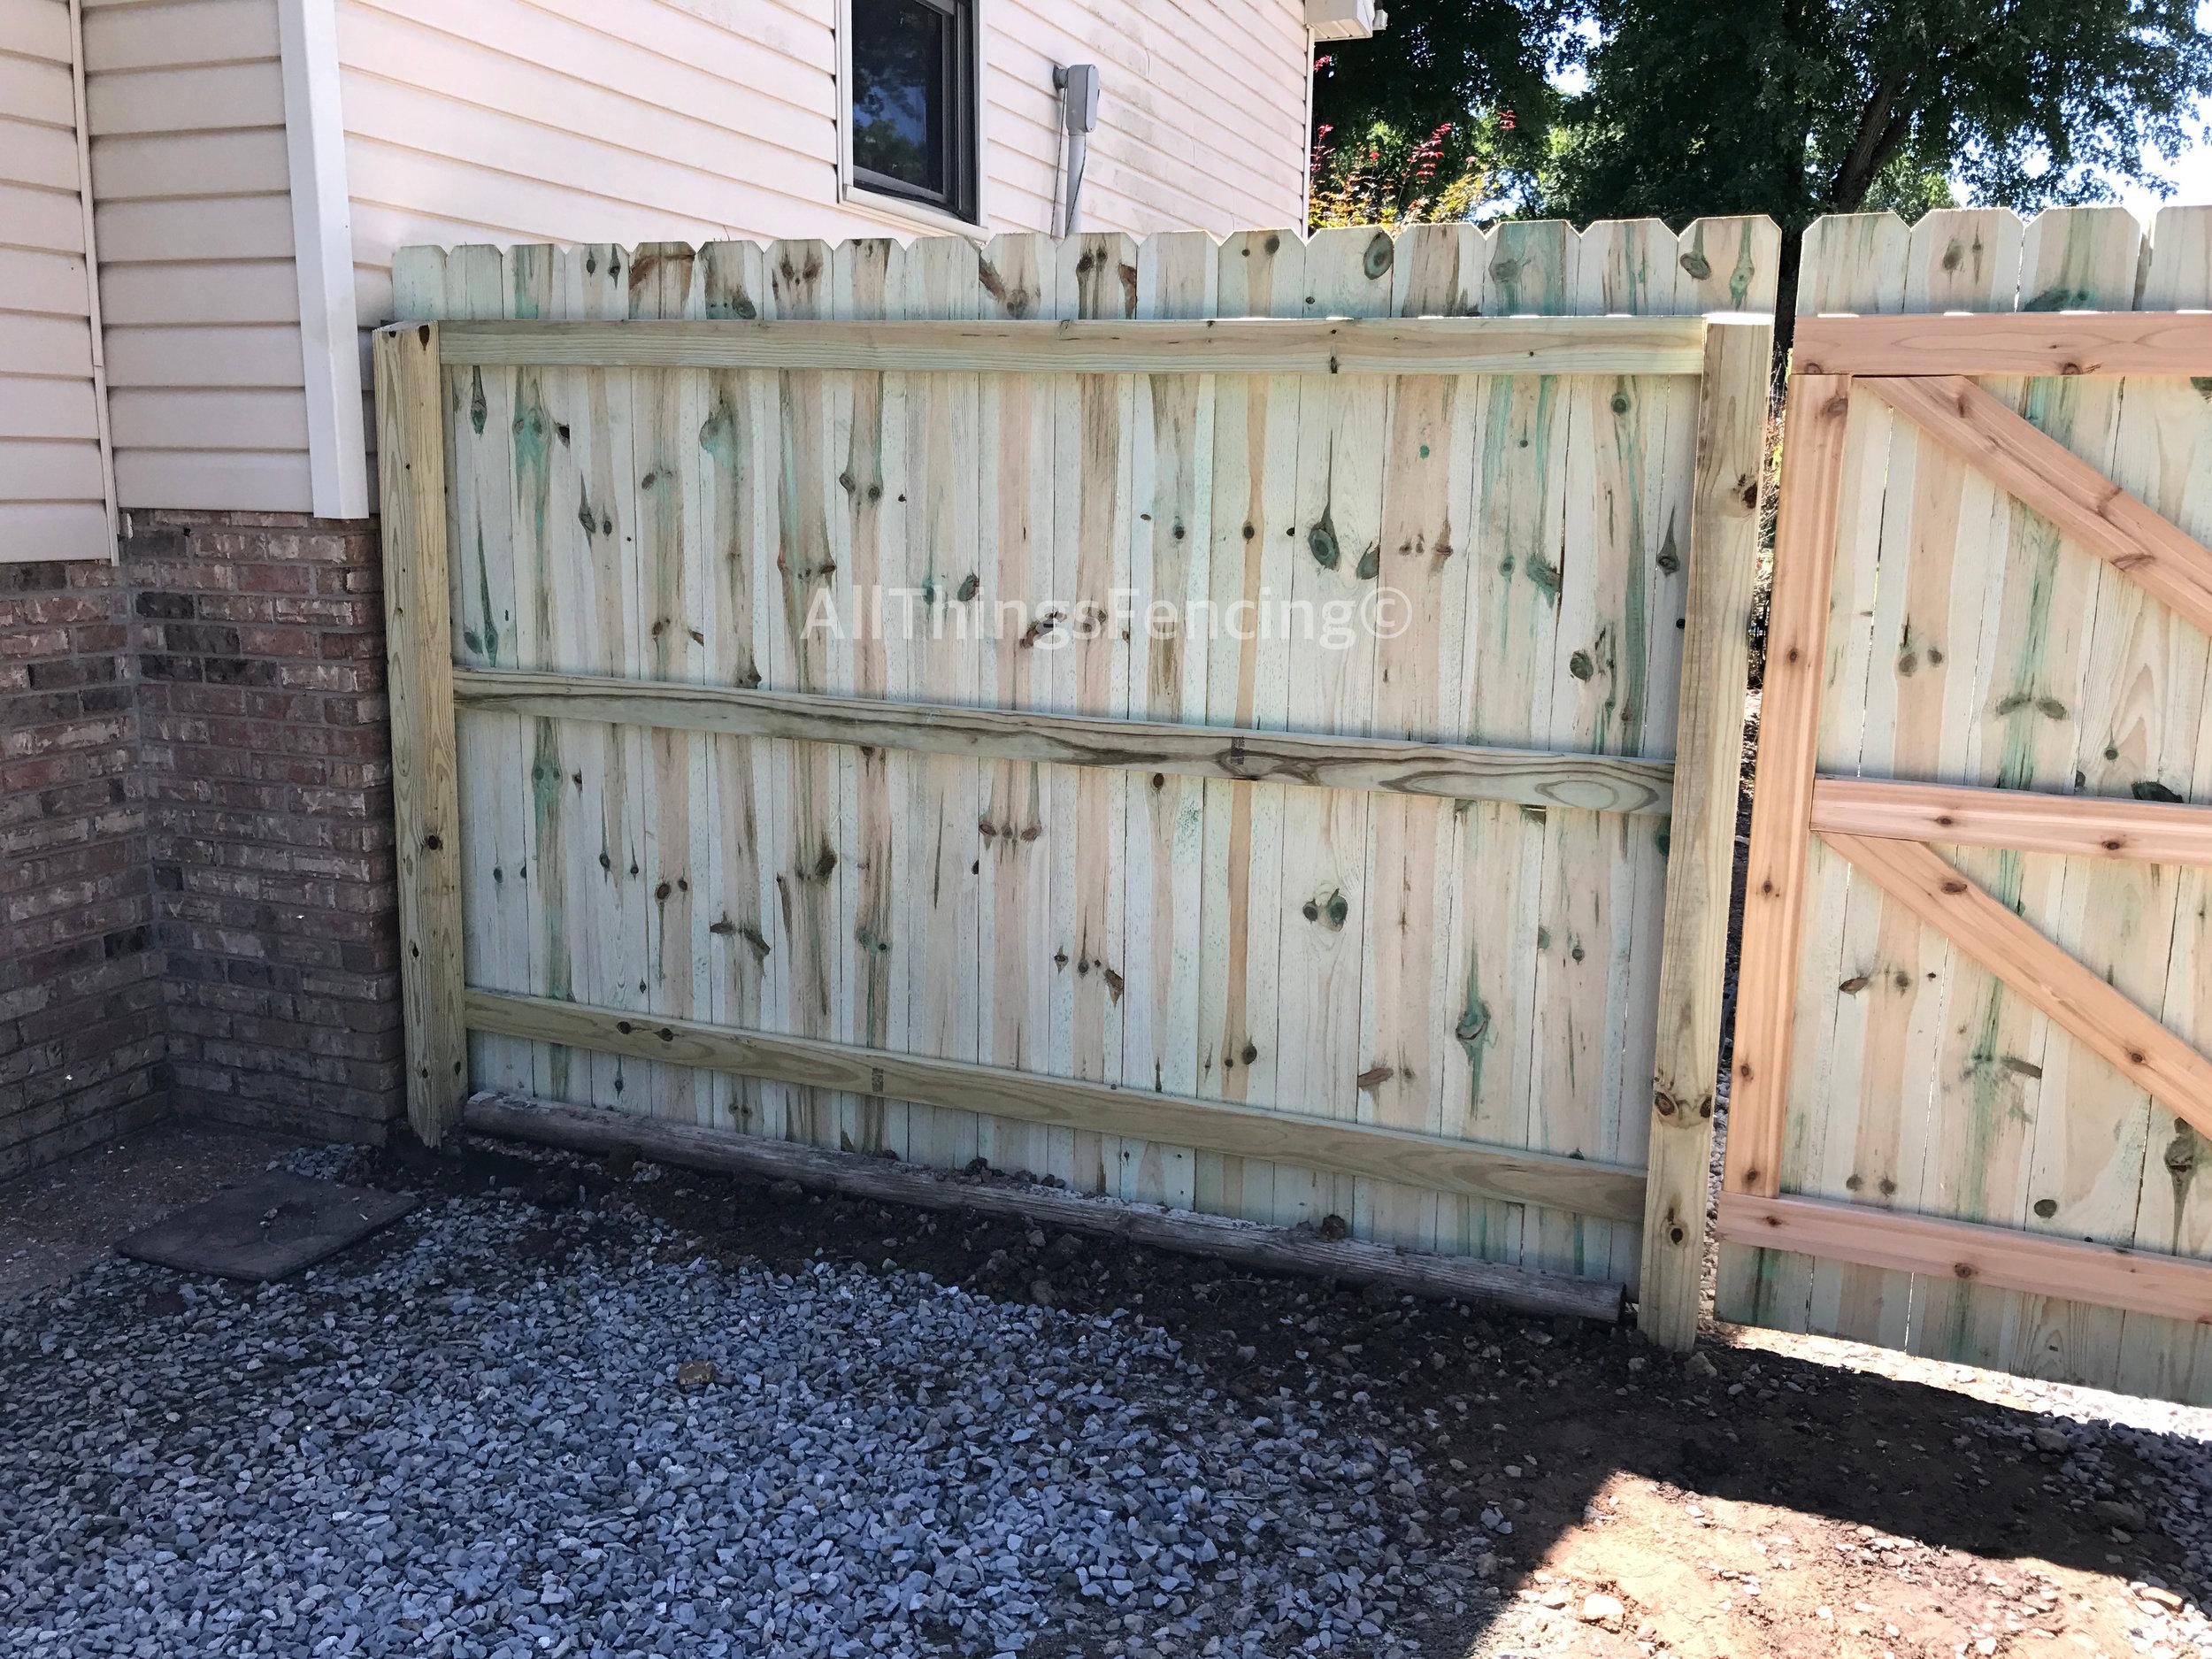 Fence39.jpg